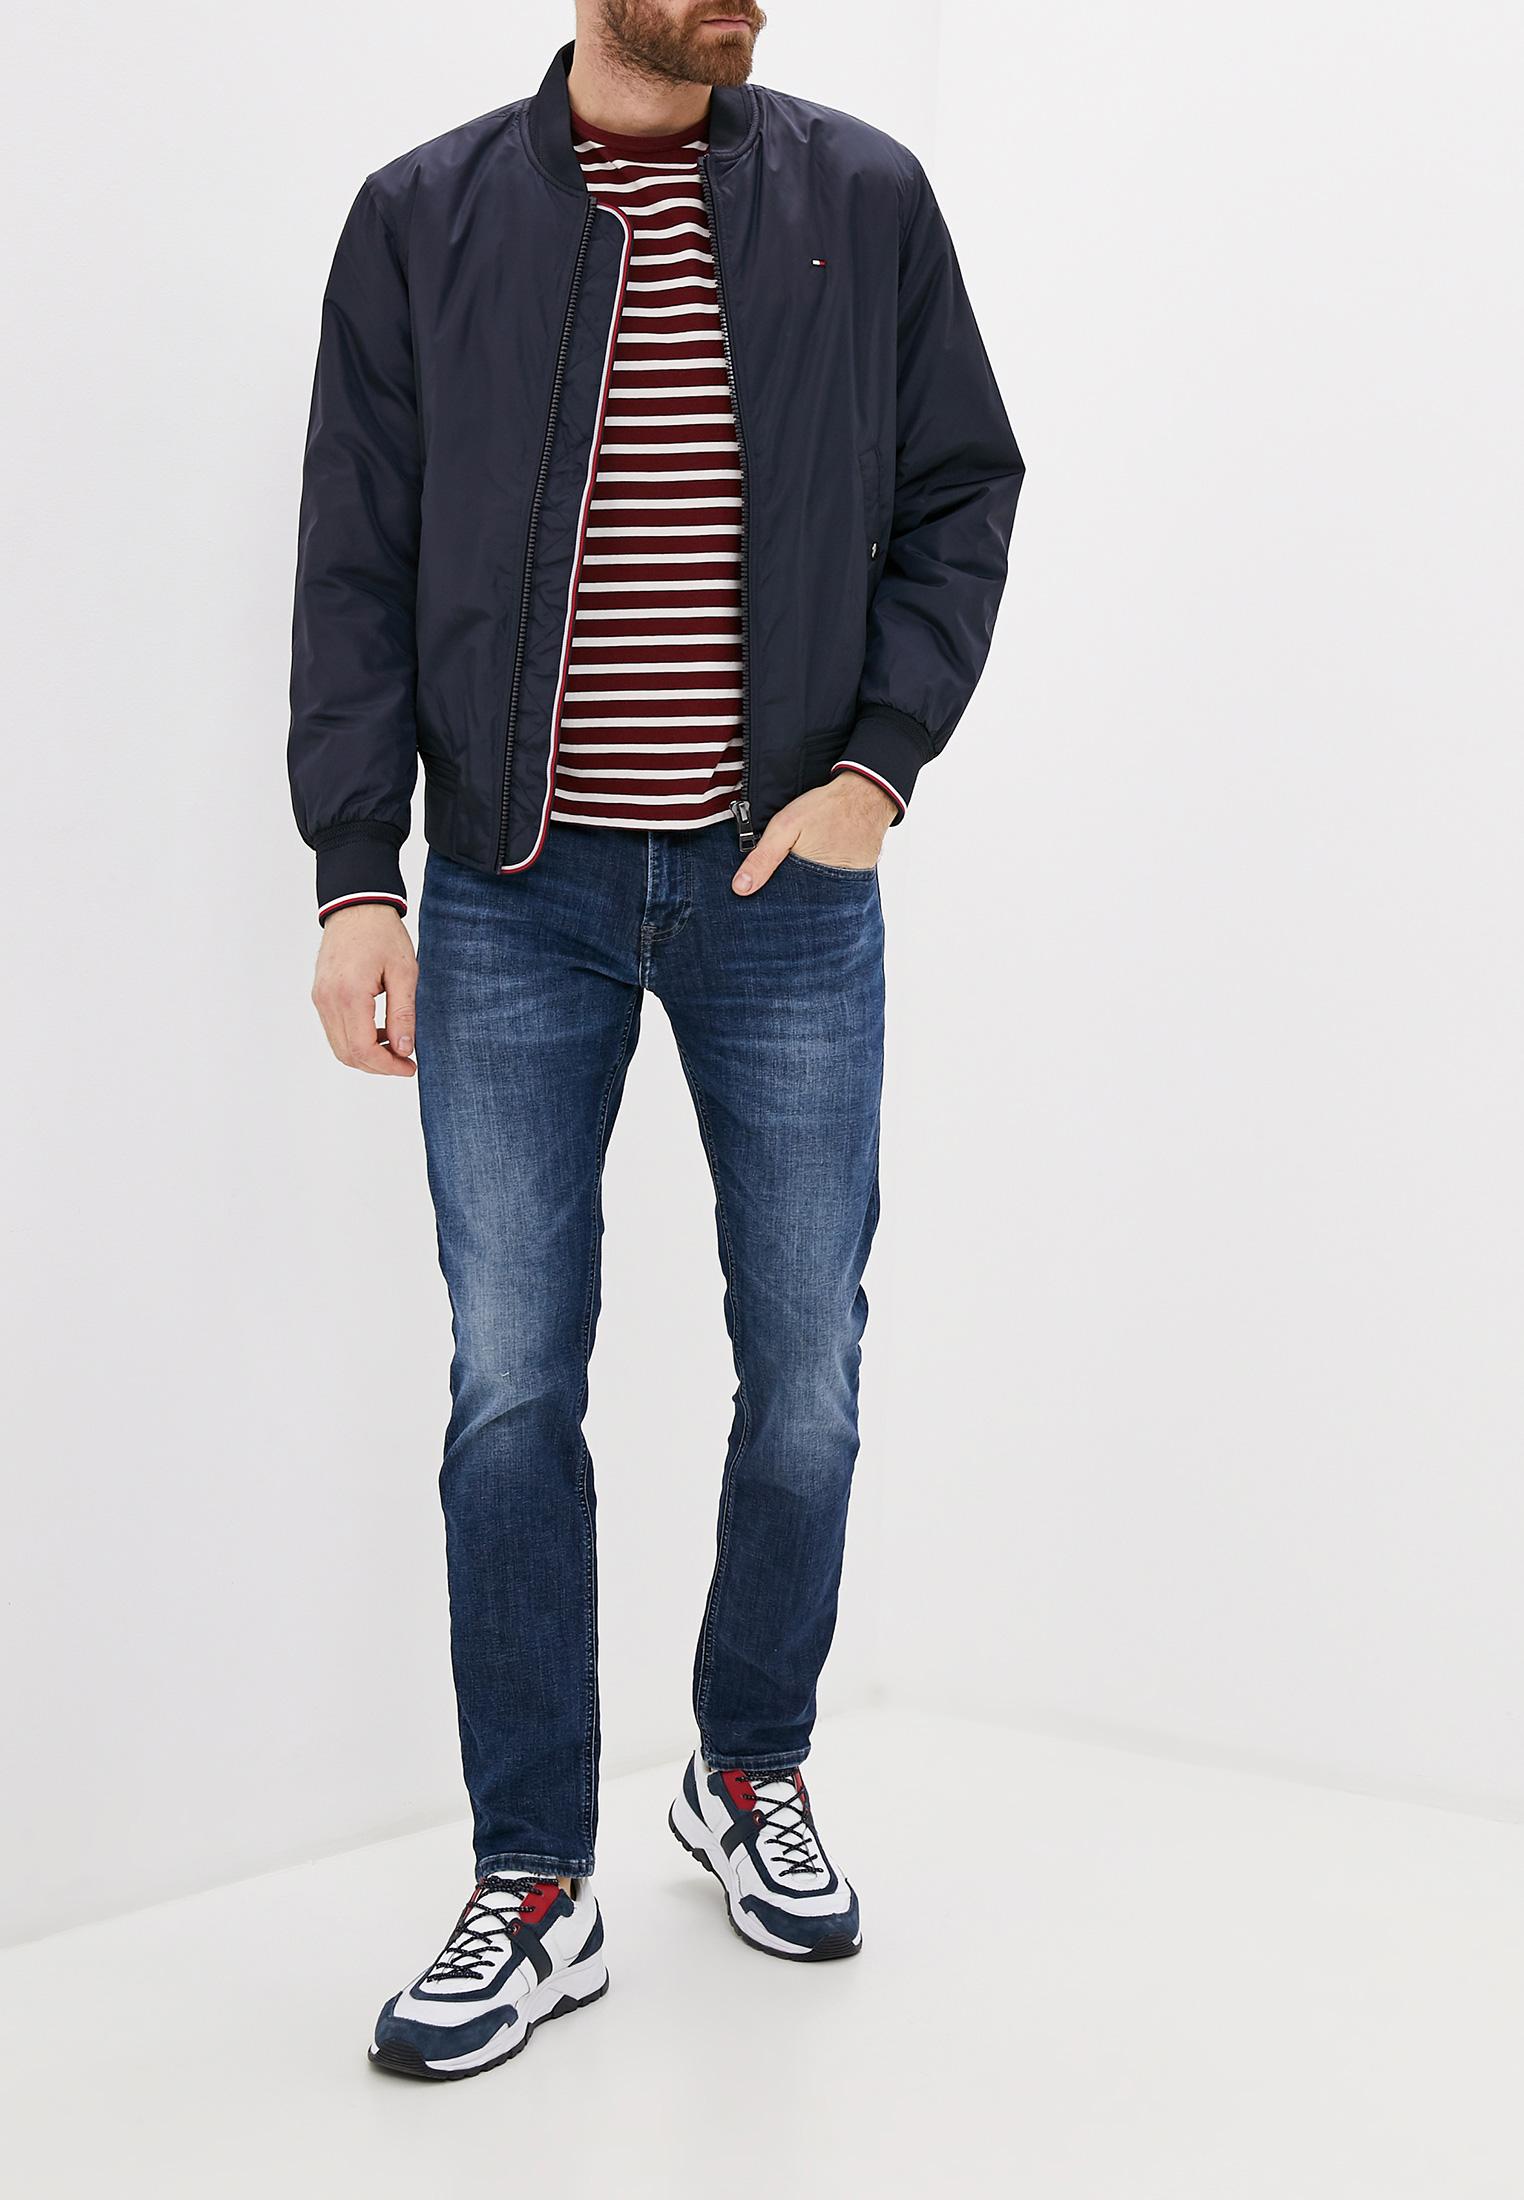 Куртка Tommy Hilfiger (Томми Хилфигер) MW0MW12006: изображение 2